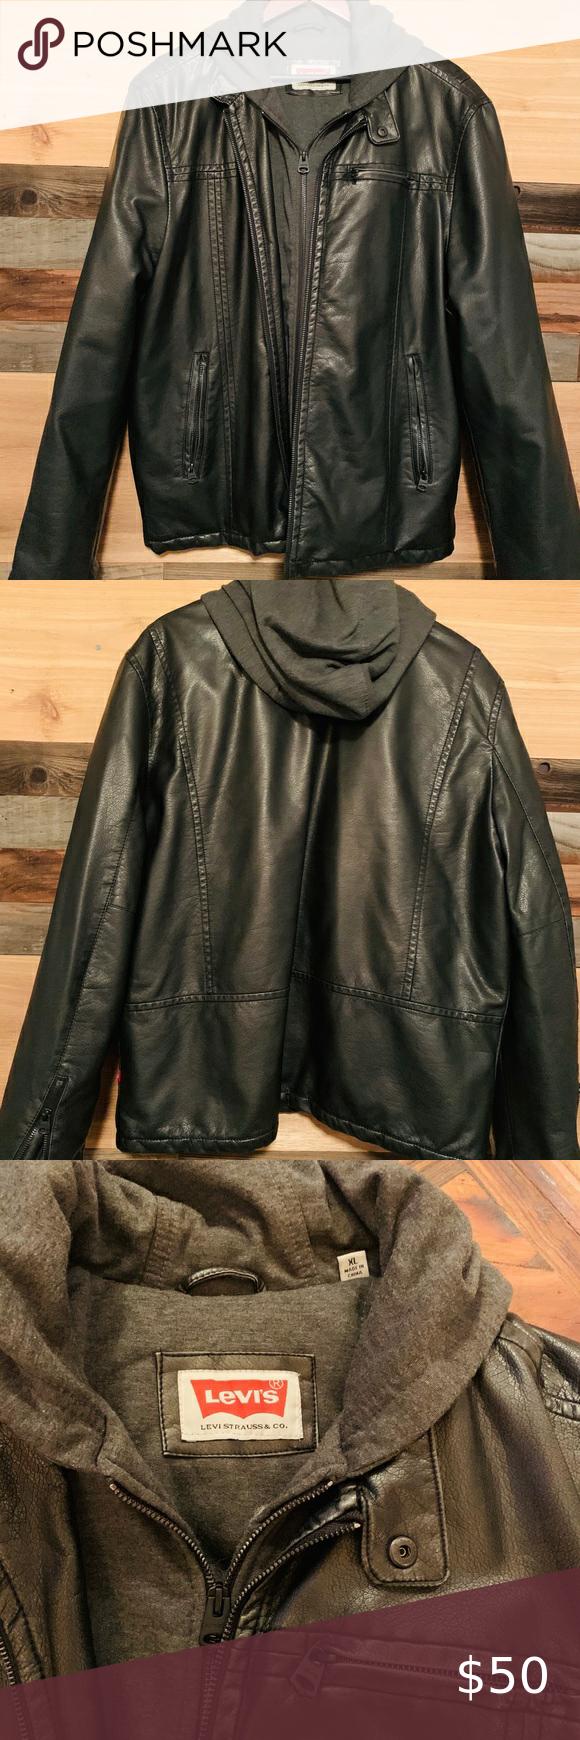 Levi's black leather jacket in 2020 Leather jacket